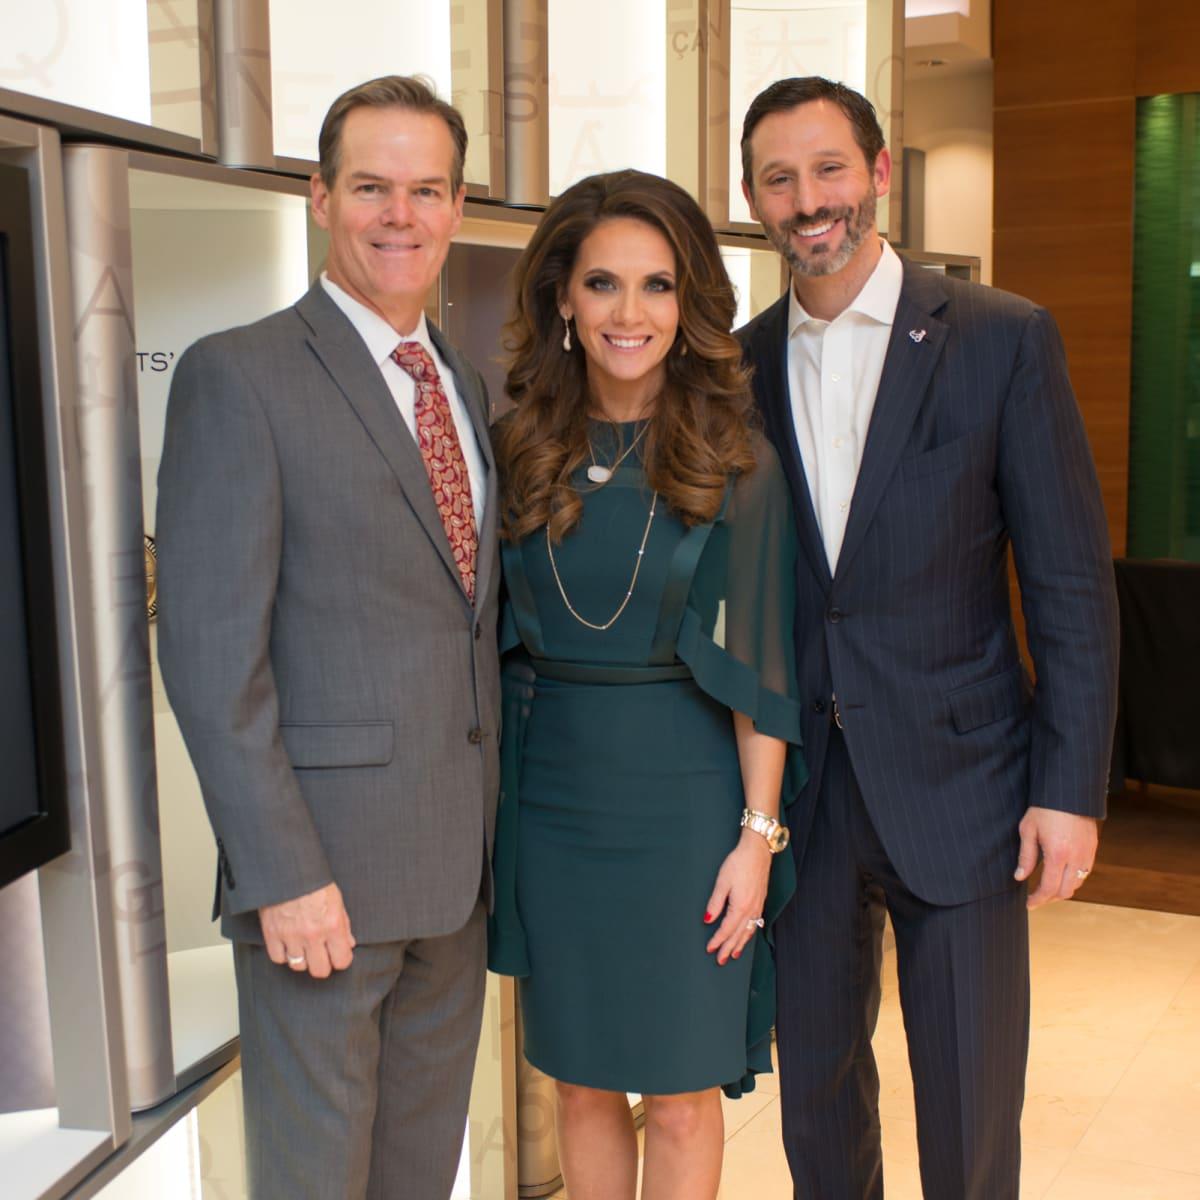 News, IW Marks Rolex Event, Dec. 2015, Jeff Cotton, Joanna Marks, Brad Marks